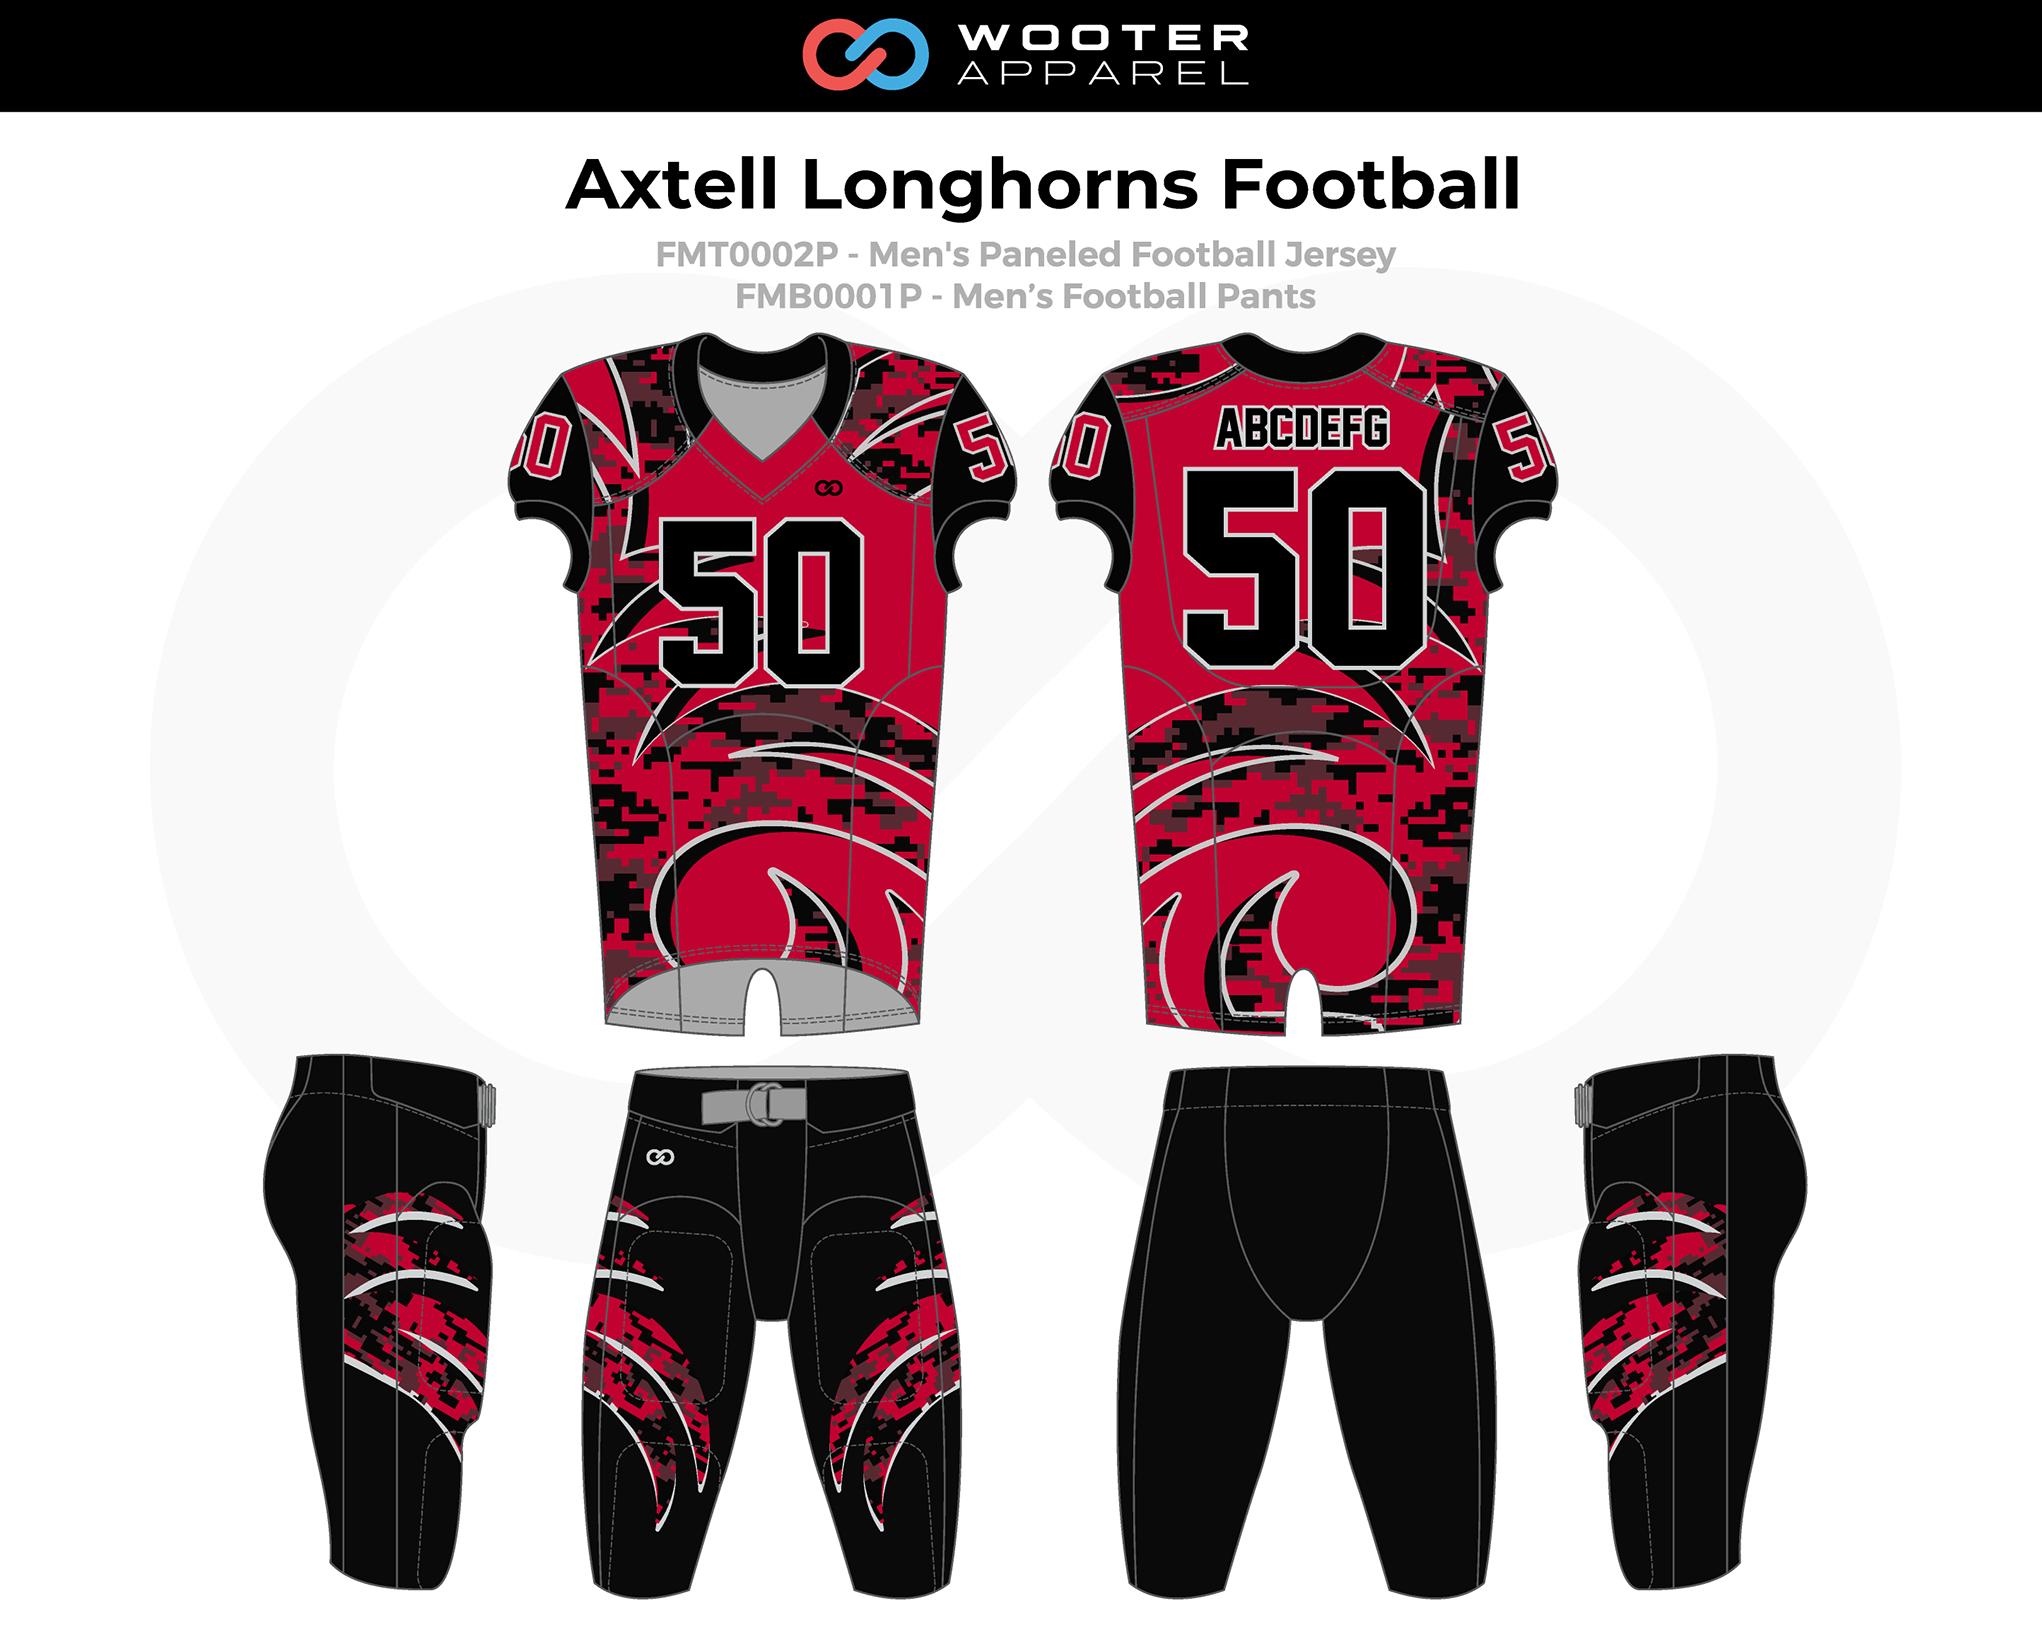 AXTELL LONGHORNS Red Black Men's Football Uniforms, Jerseys, and Pants